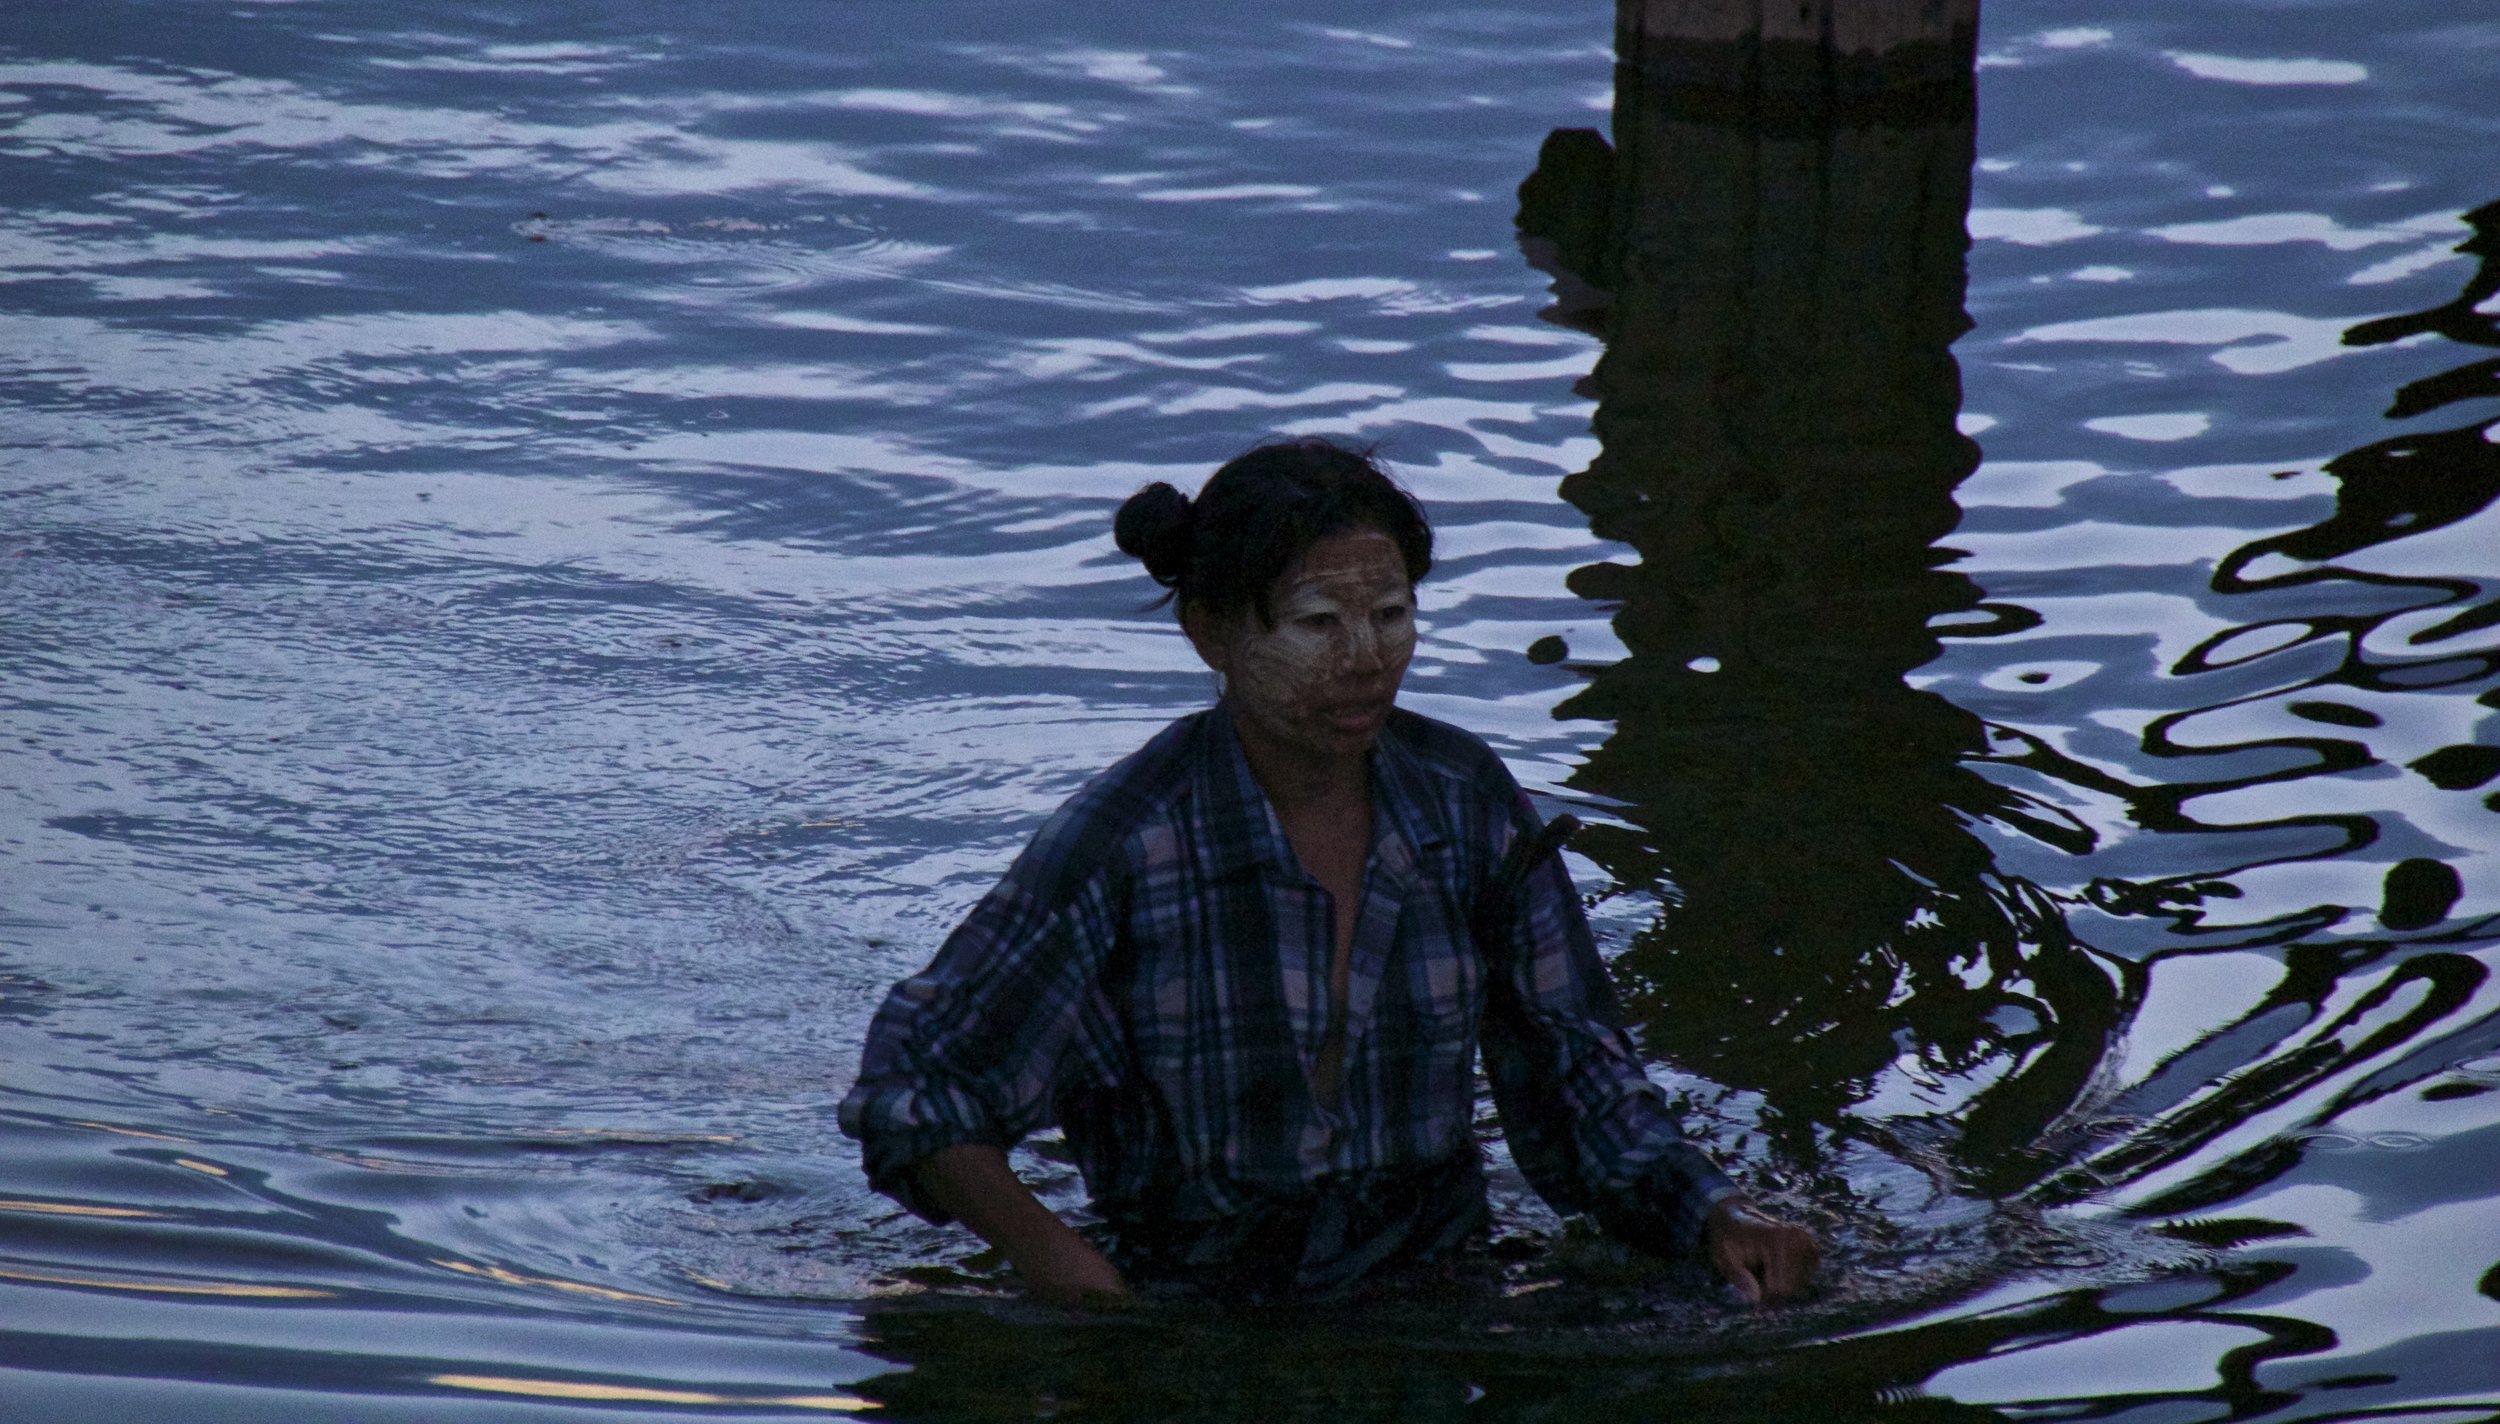 U Bein Bridge Mandalay Burma Myanmar 18.jpg